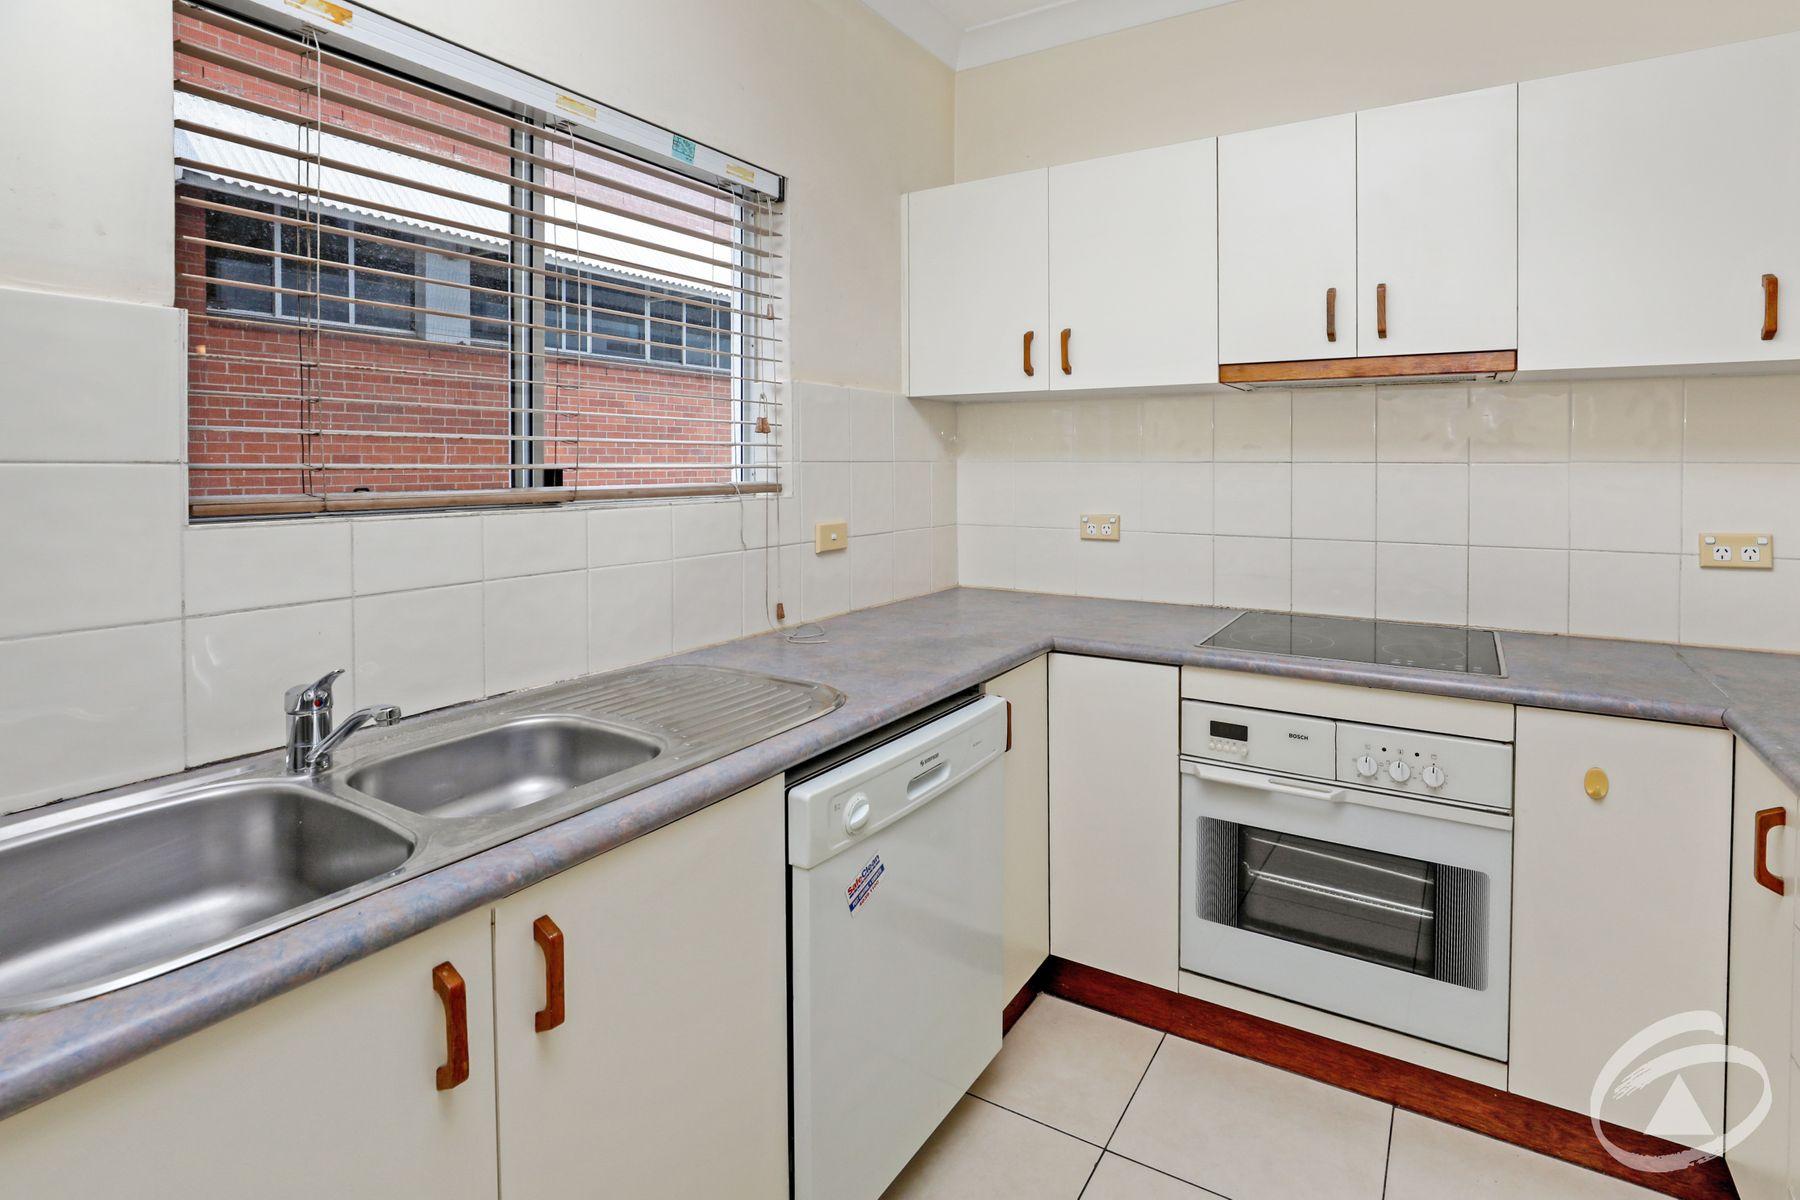 6/7 Minnie Street, Cairns City, QLD 4870